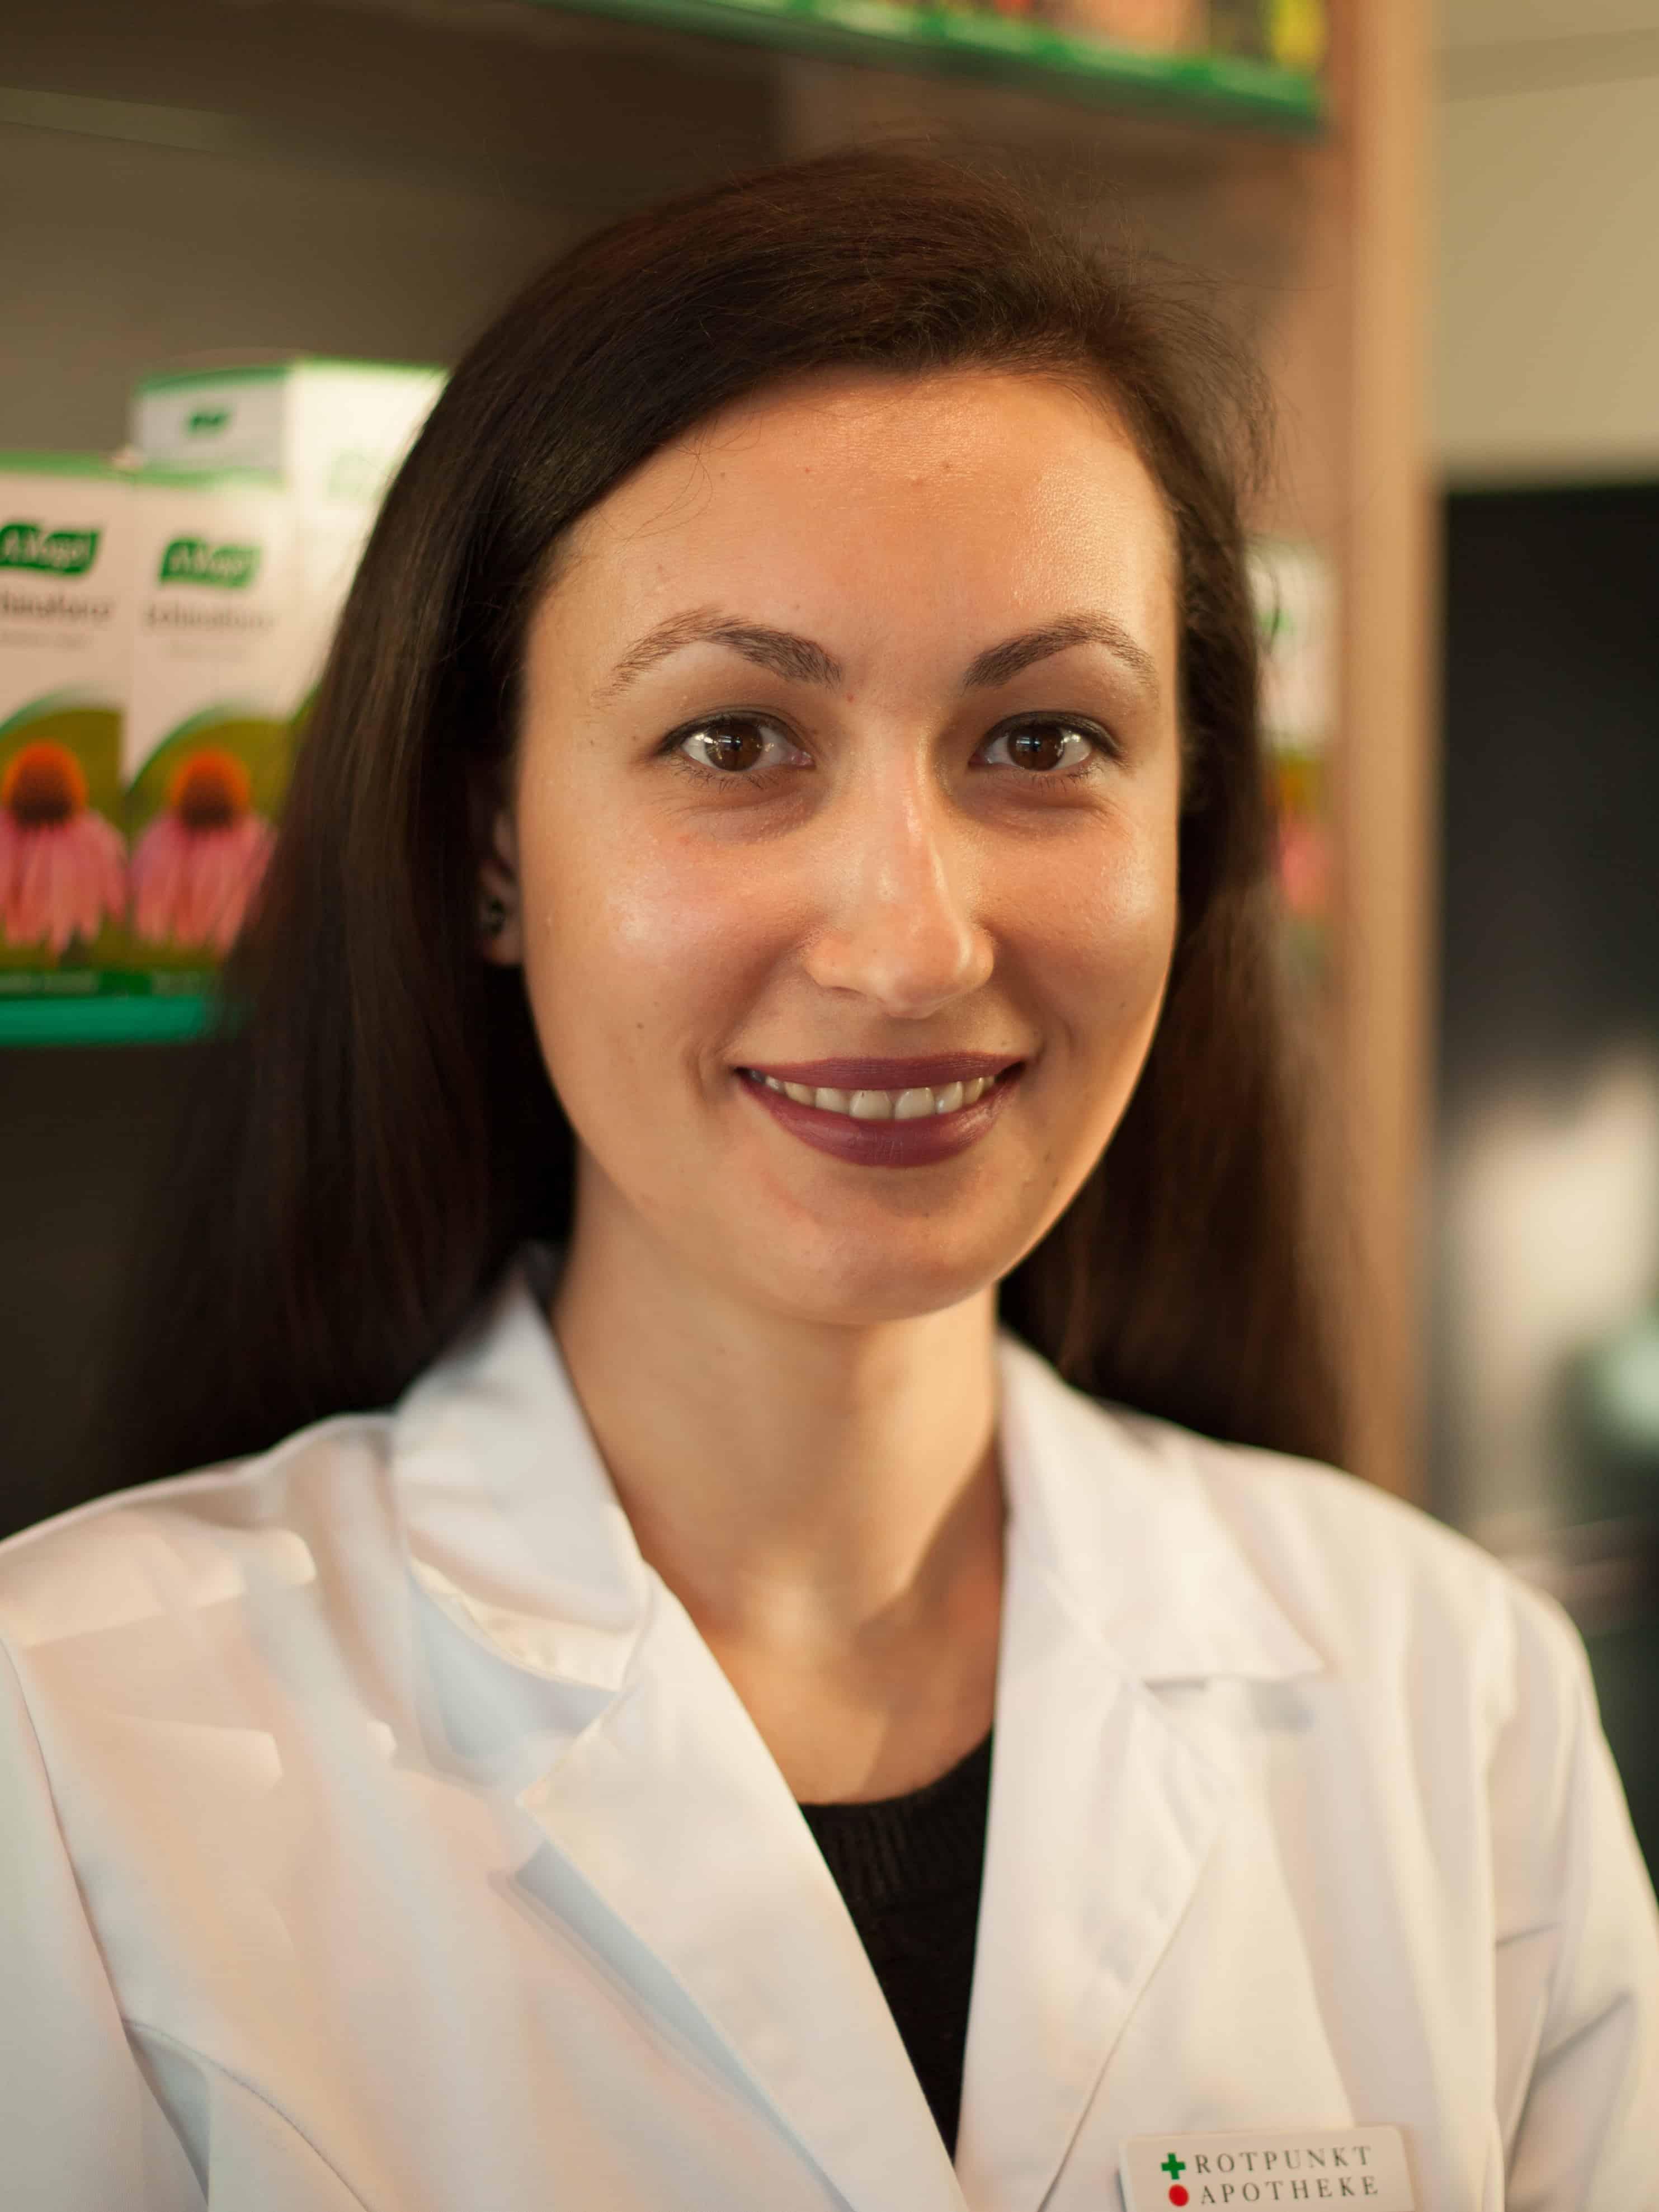 Kirilka Gutleben - Apotheke Dr. Kunz Schlieren